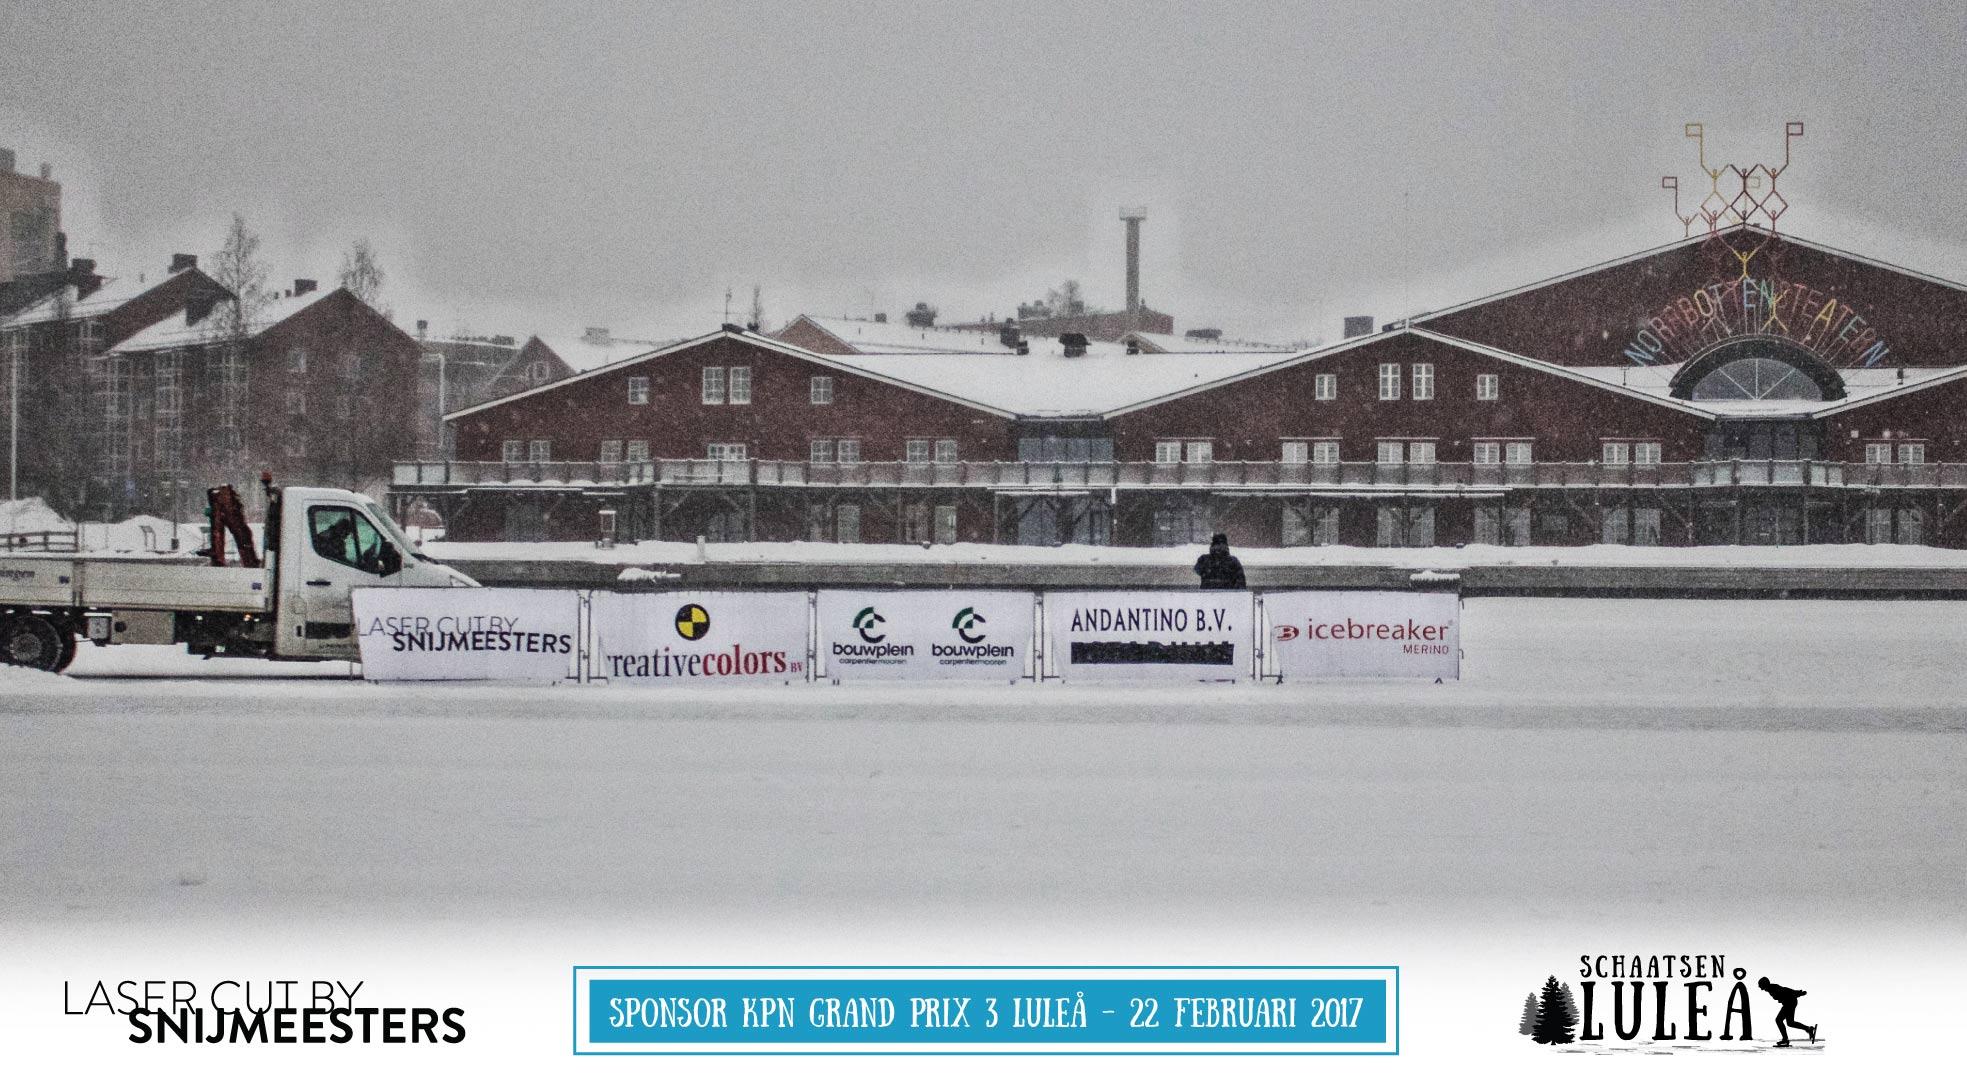 snijmeester-natuurijs-lulea-lapland-kpn-grand-prix